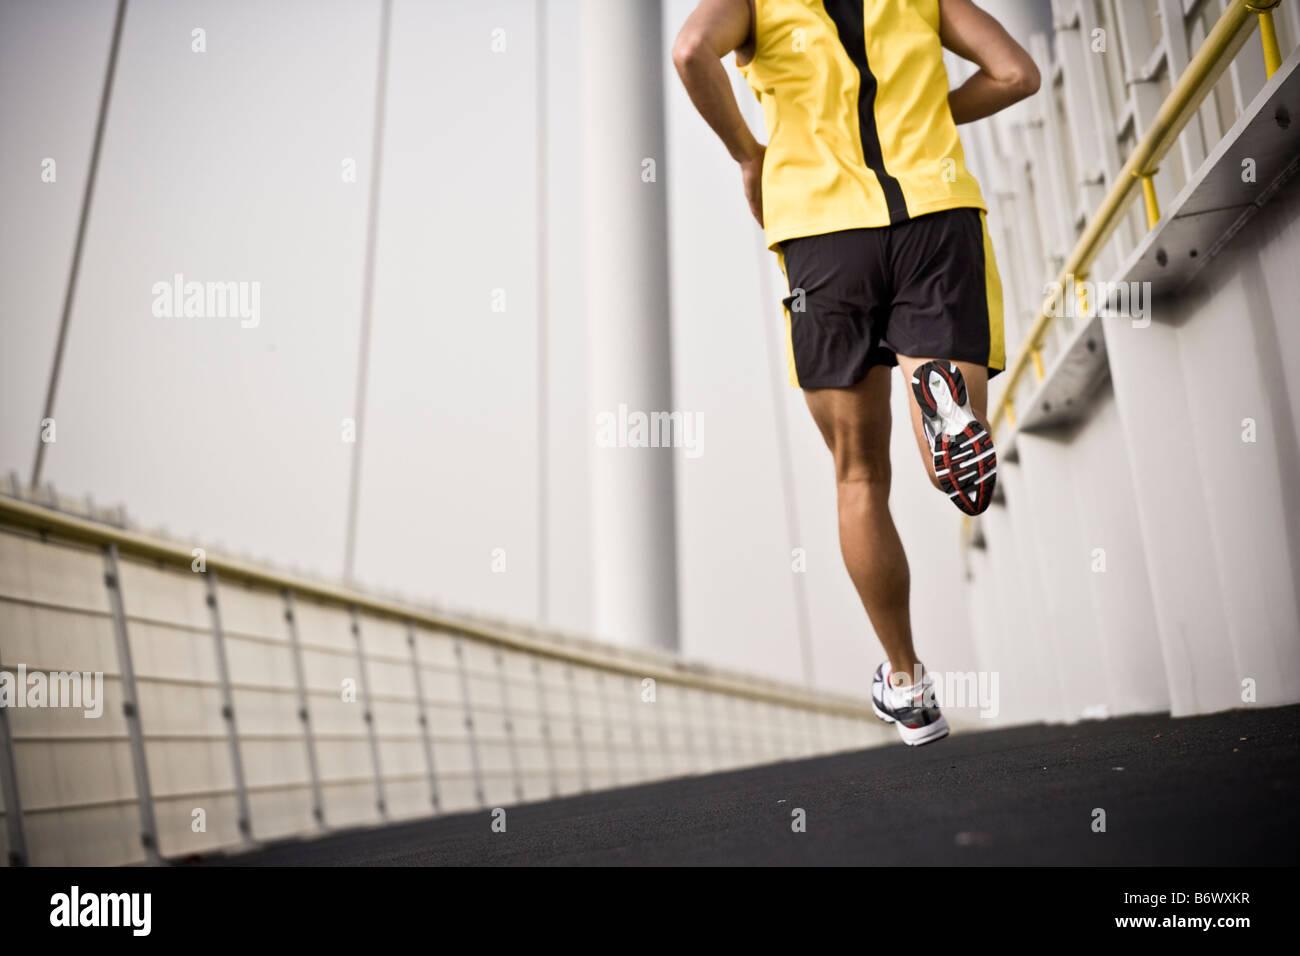 Man running across a bridge. - Stock Image